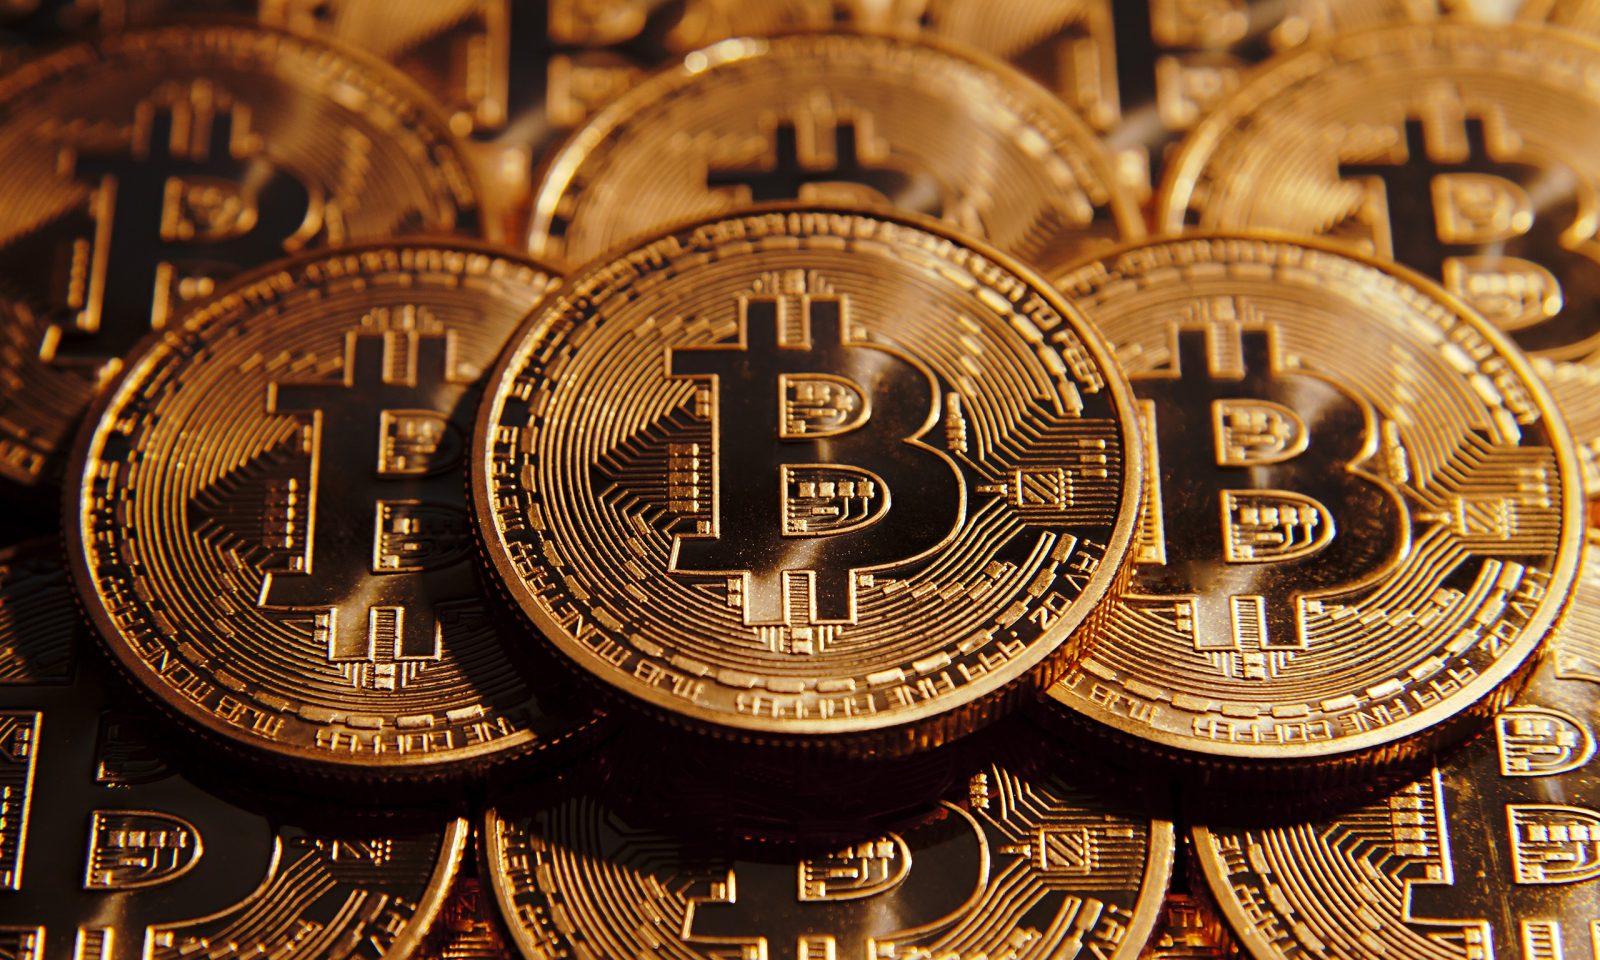 cum am câștigat bani pe bitcoin